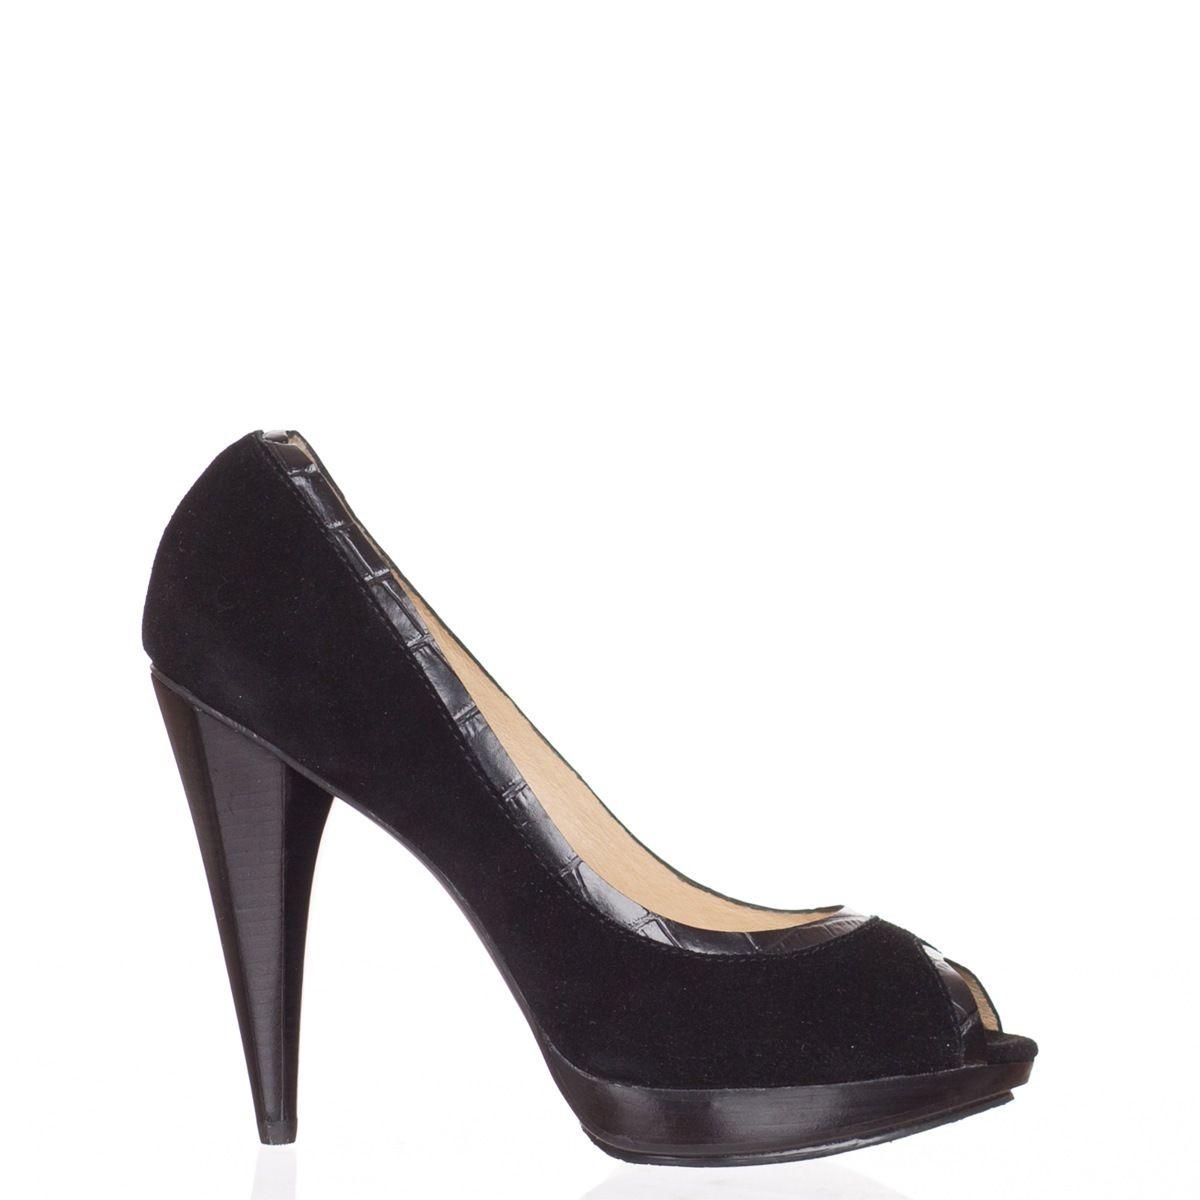 5ec9a075a12 Michael Kors Women s Black Suede Peep Toe Heels Shoes